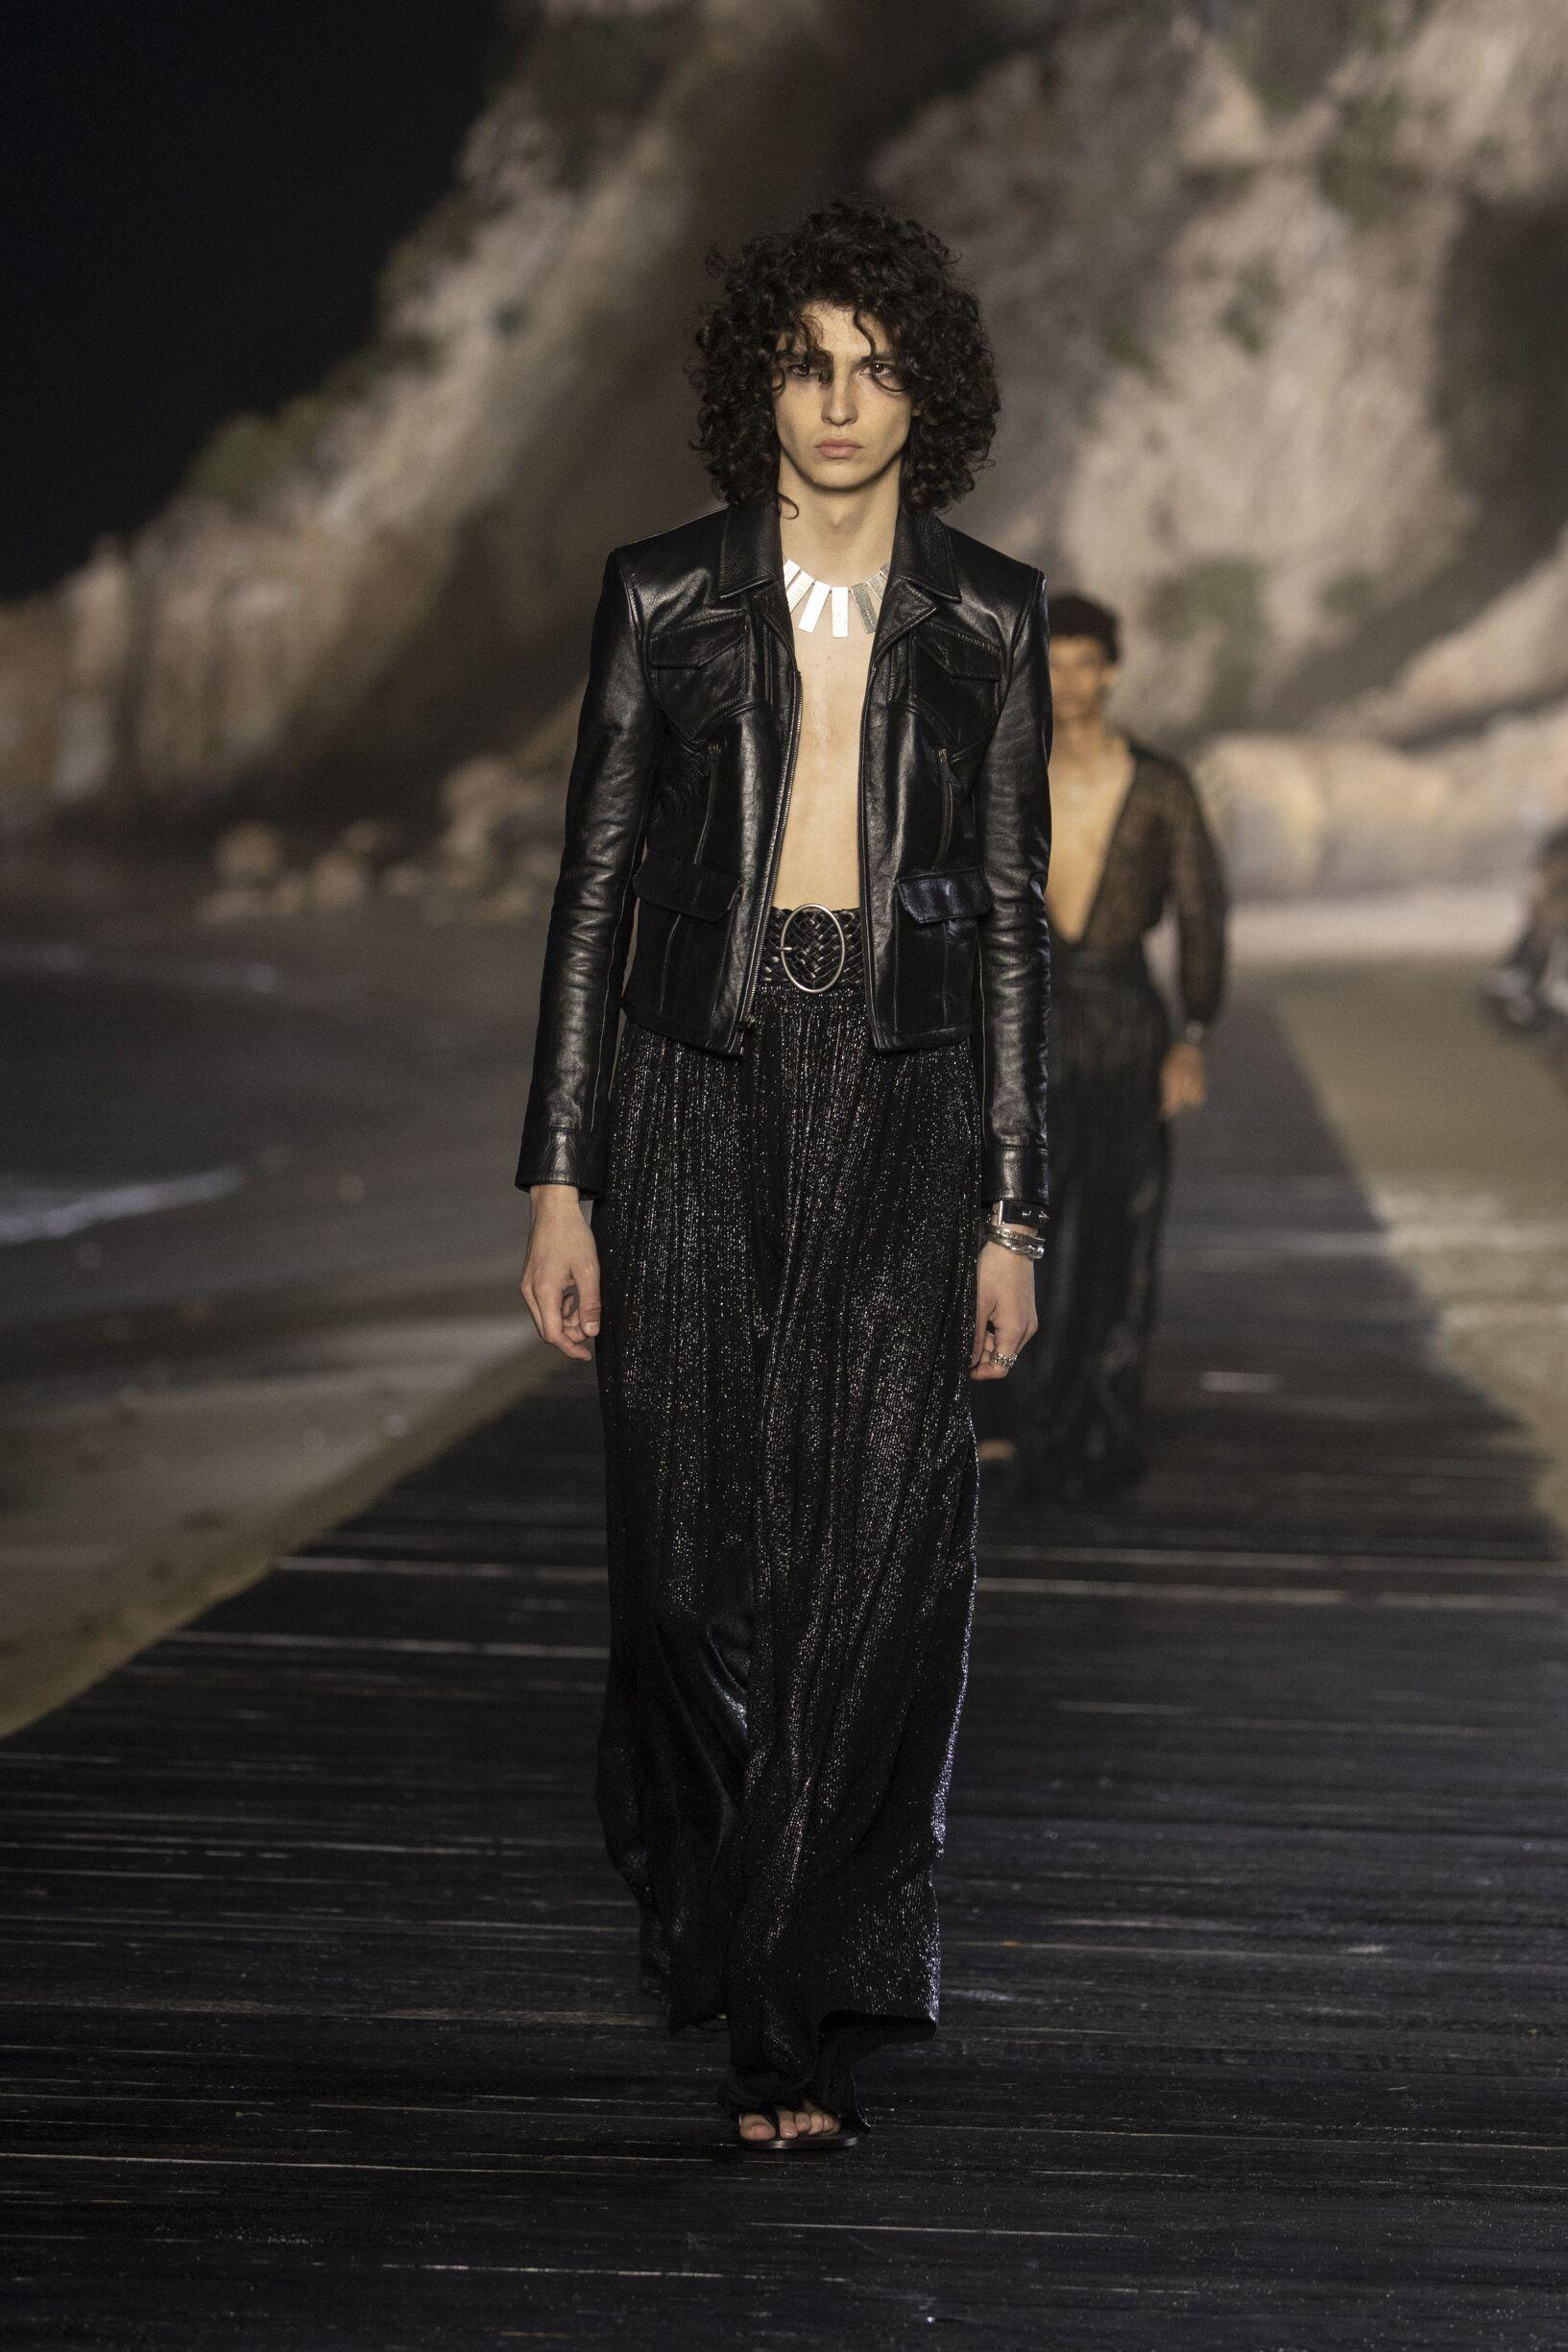 Man SS 2020 Saint Laurent Show Malibu Fashion Show